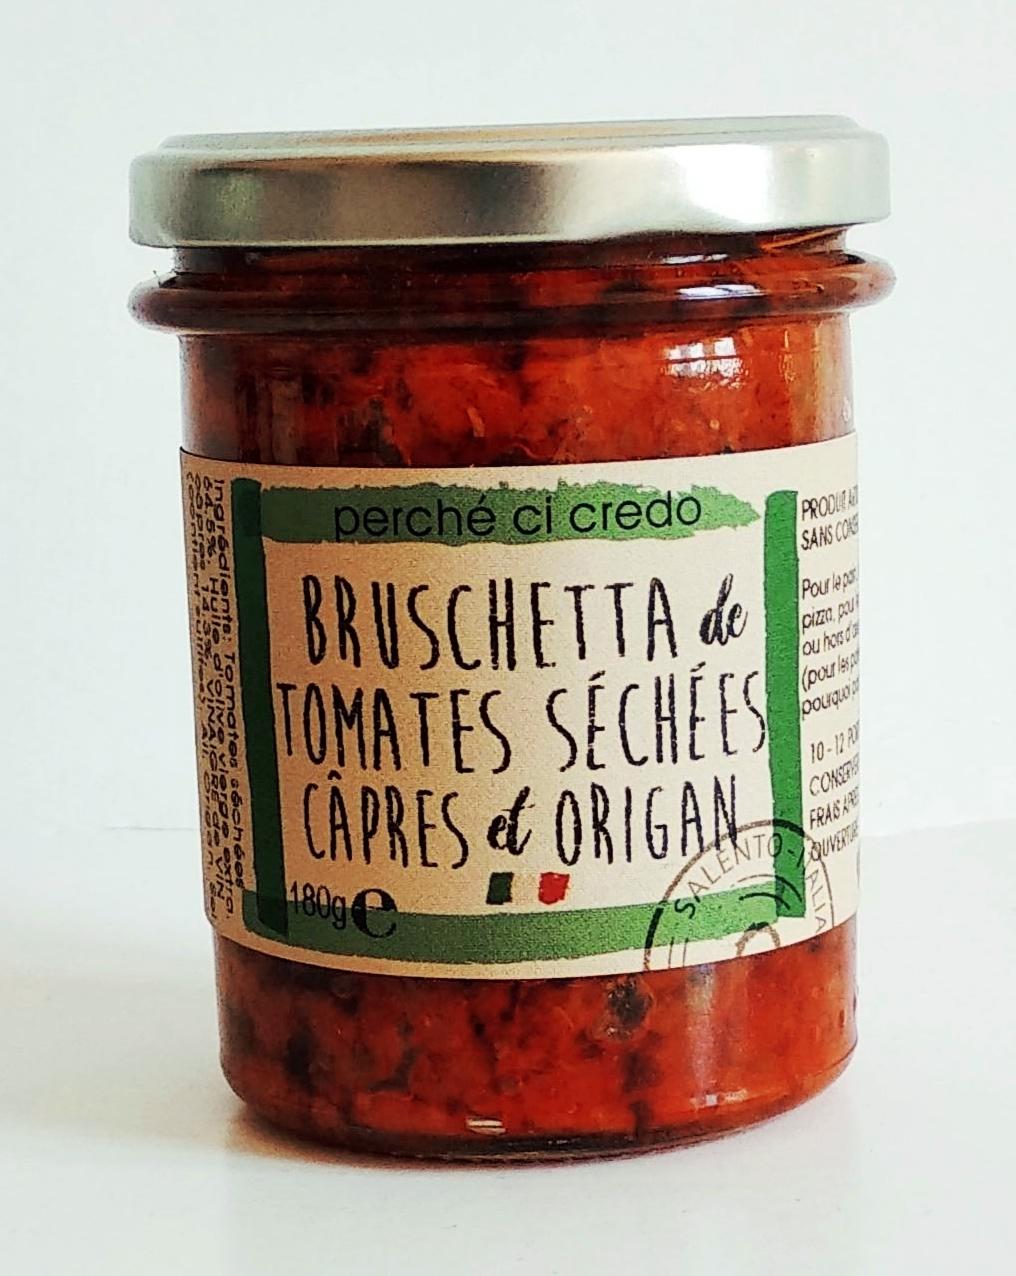 Bruschetta tomates séchées, câpres et origan, Perche Ci Credo (180 g)